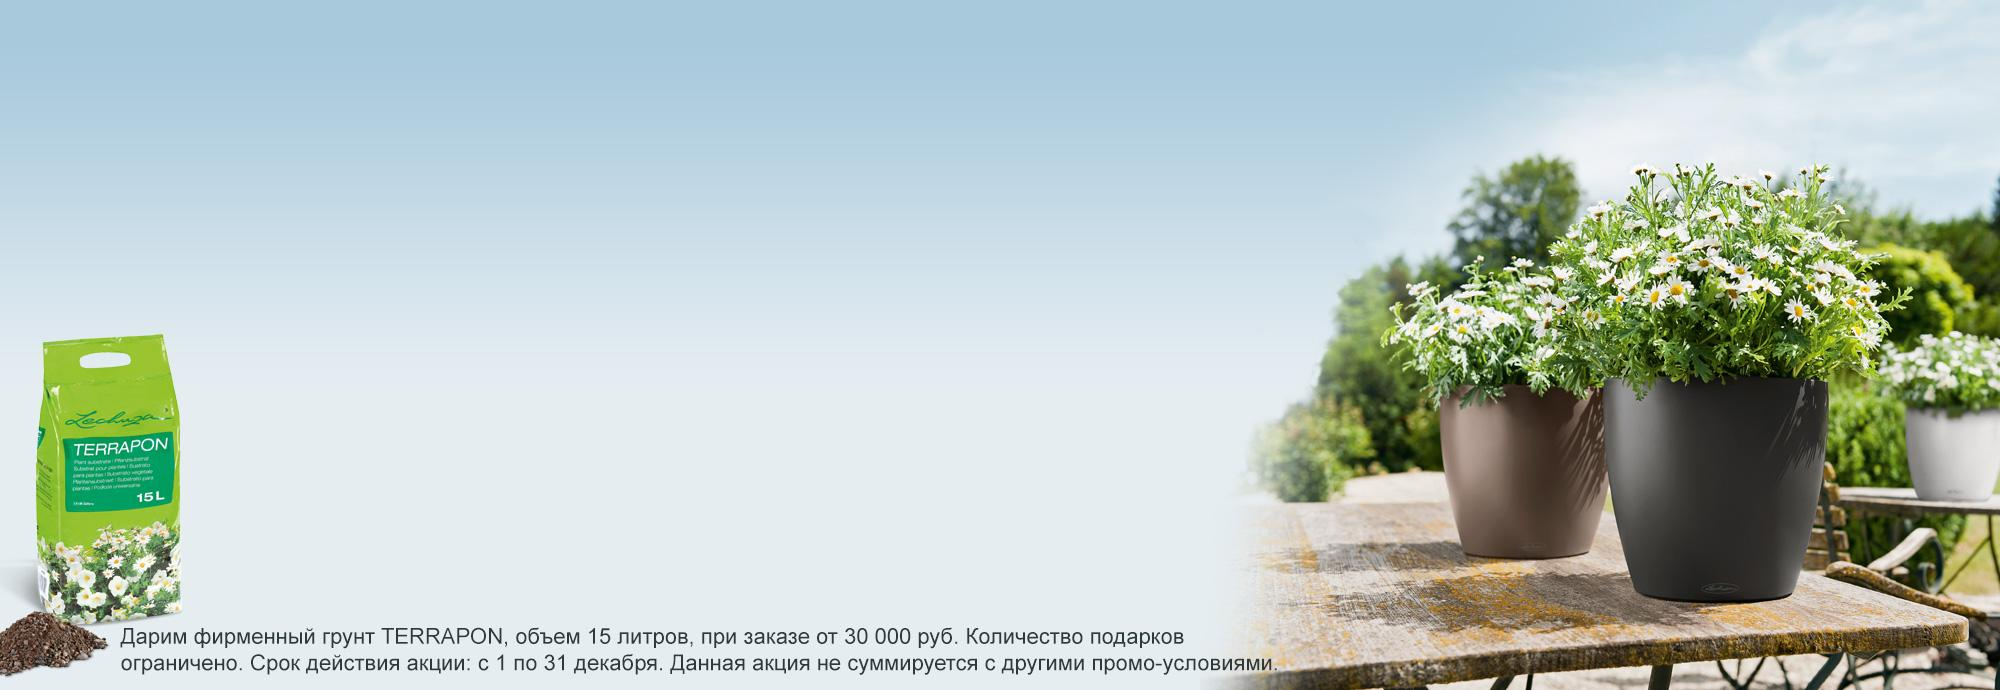 hero_banner_promo_terrapon_1812_ru